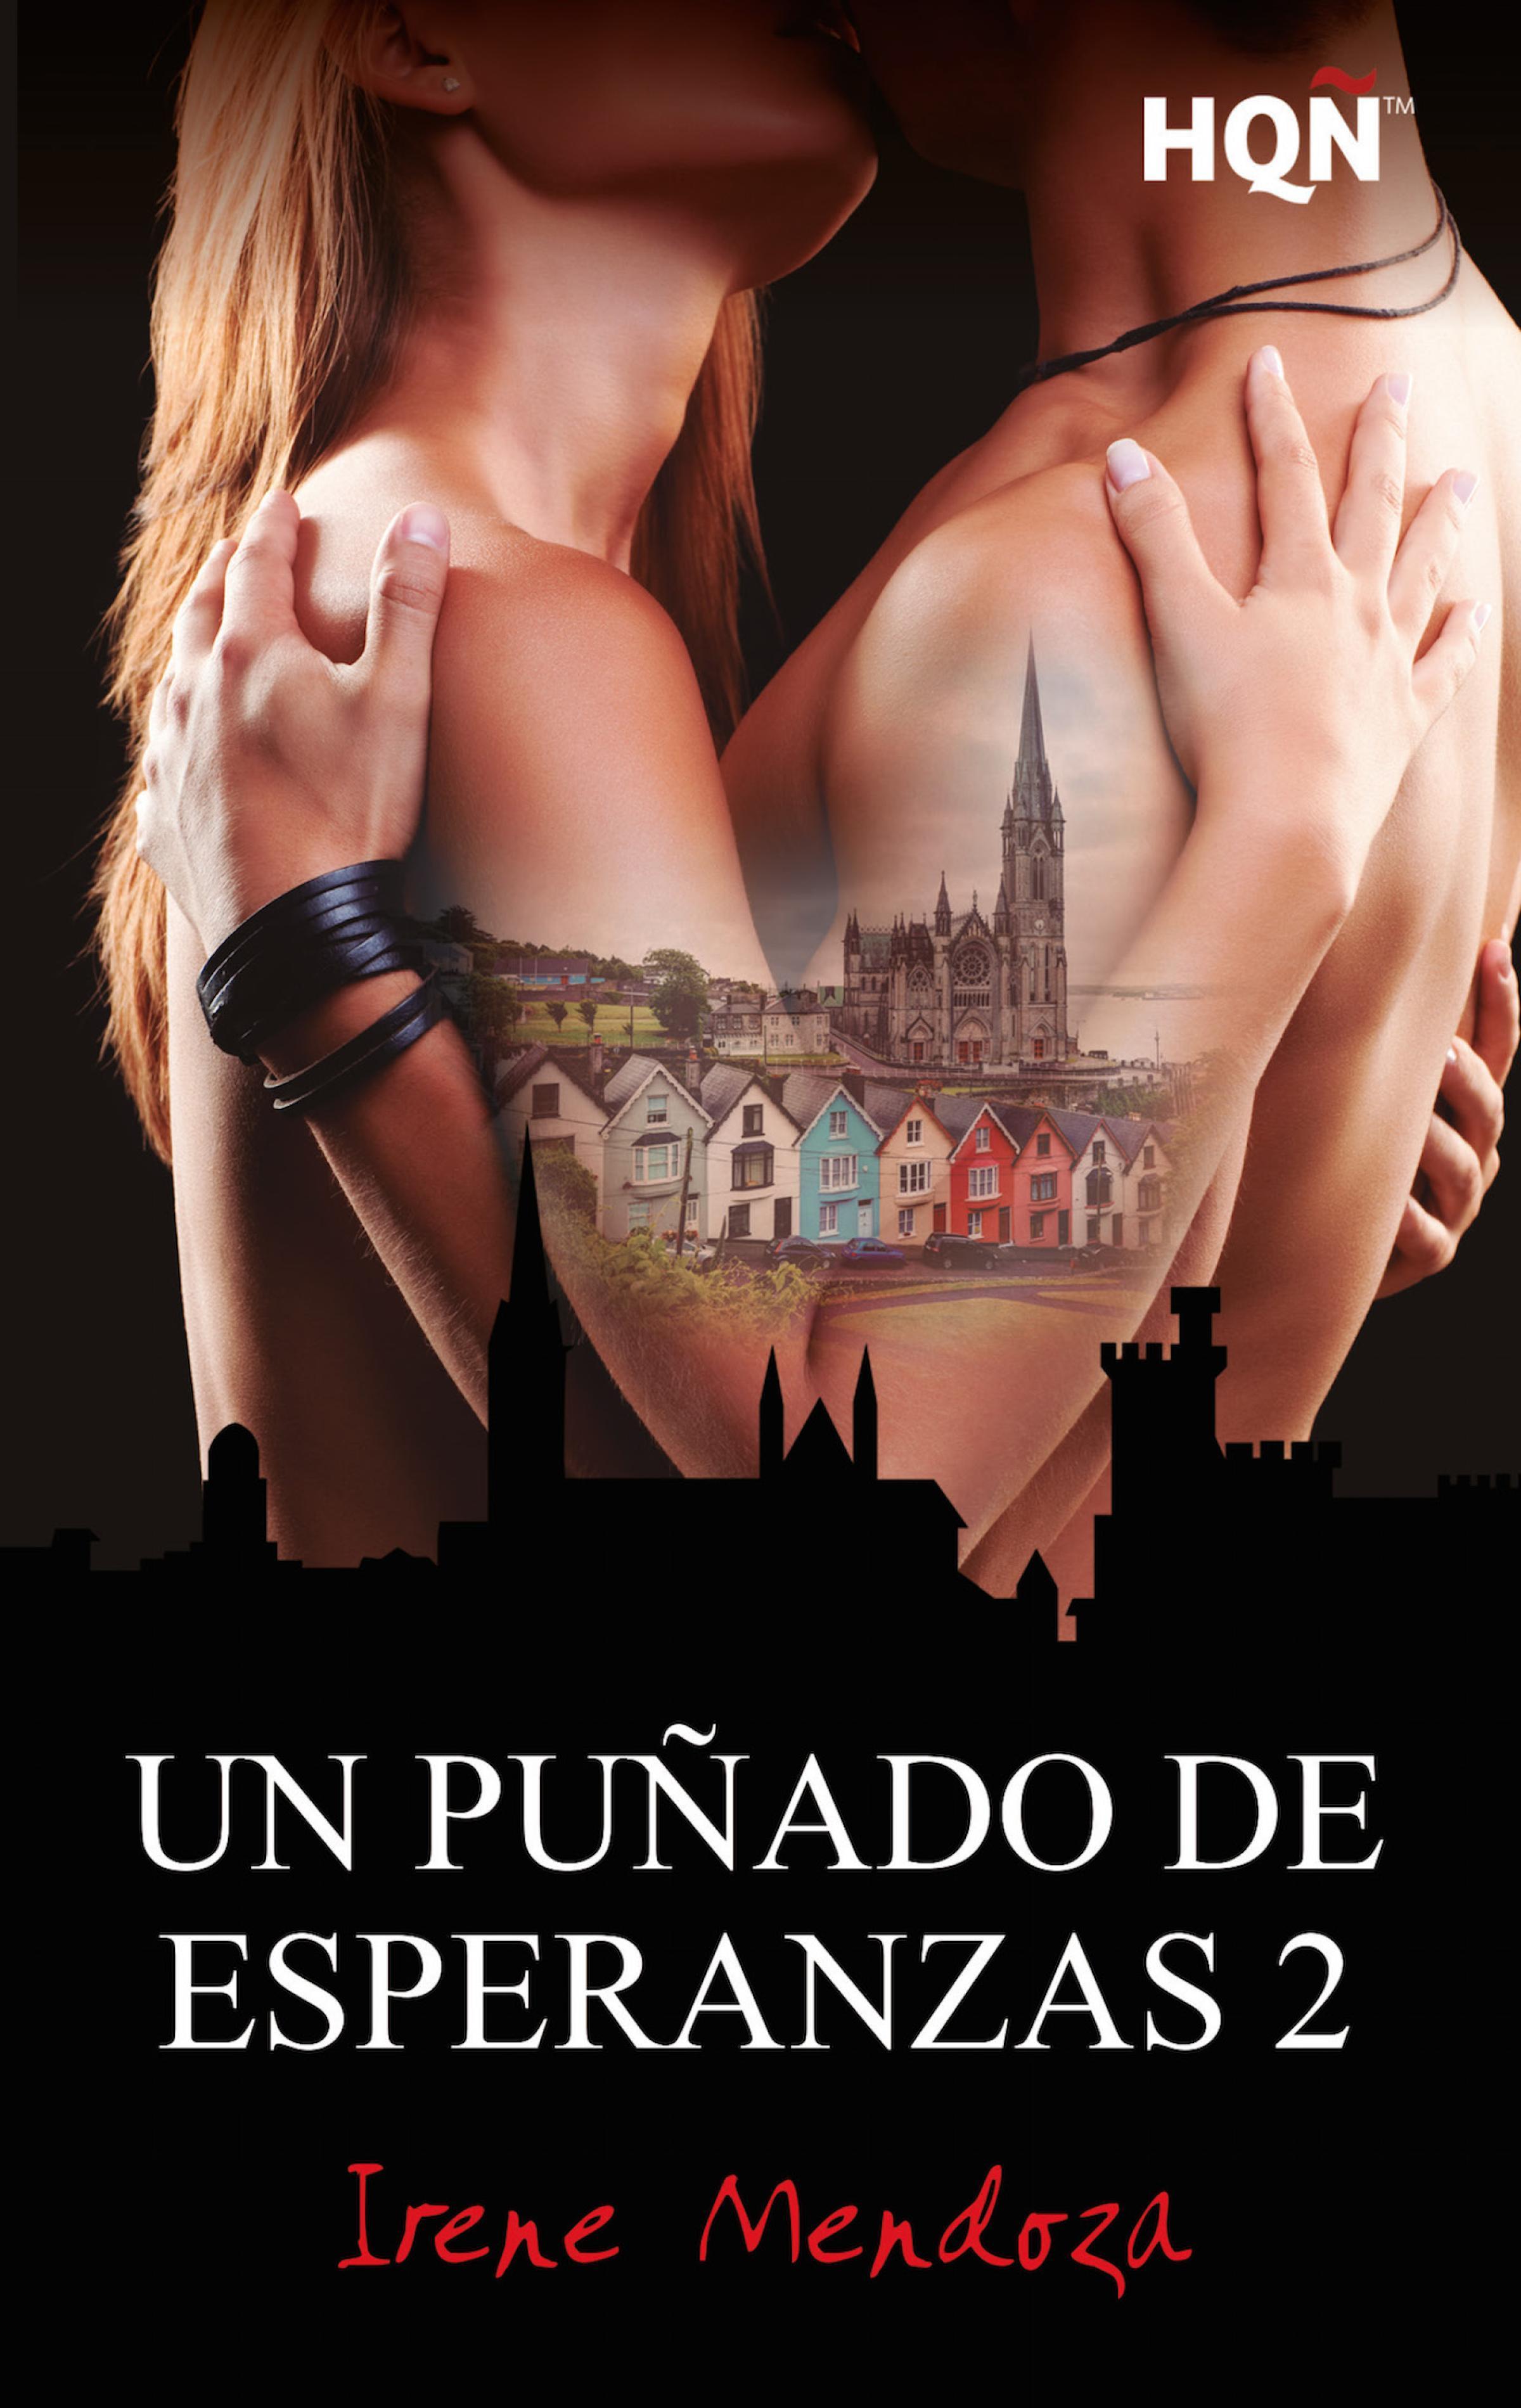 Irene Mendoza Un puñado de esperanzas 2 mendoza mendoza рюкзак для подростков этника черно оранжевый